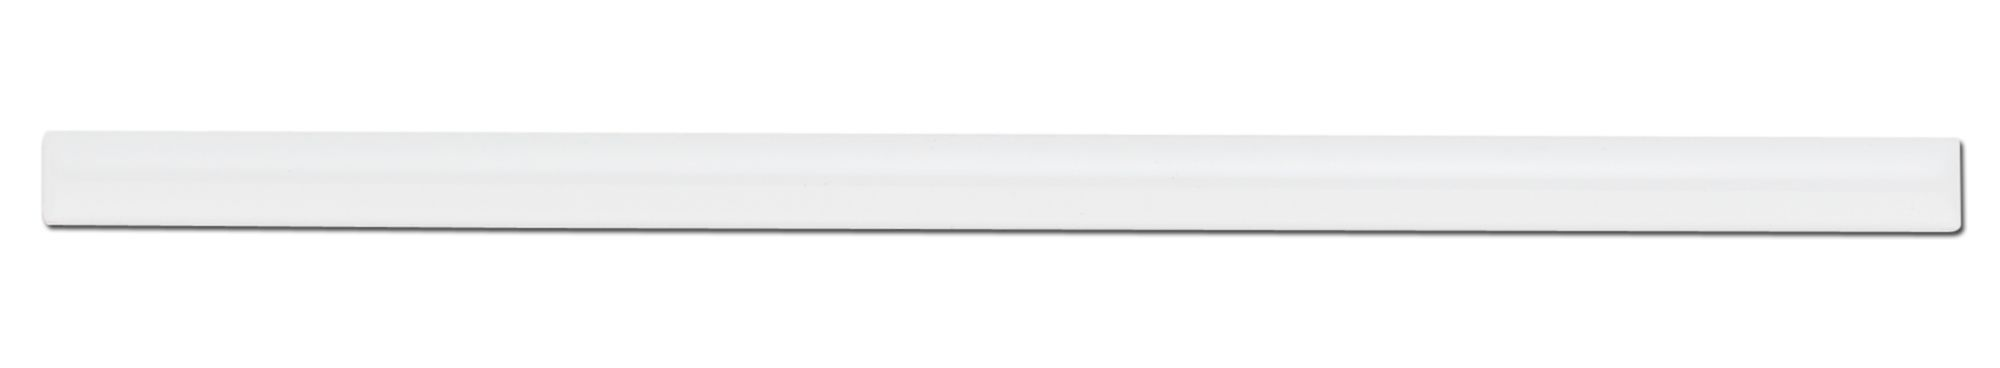 Pencil White Ceramic Border Tile, (L)250mm (W)12mm | Departments ...